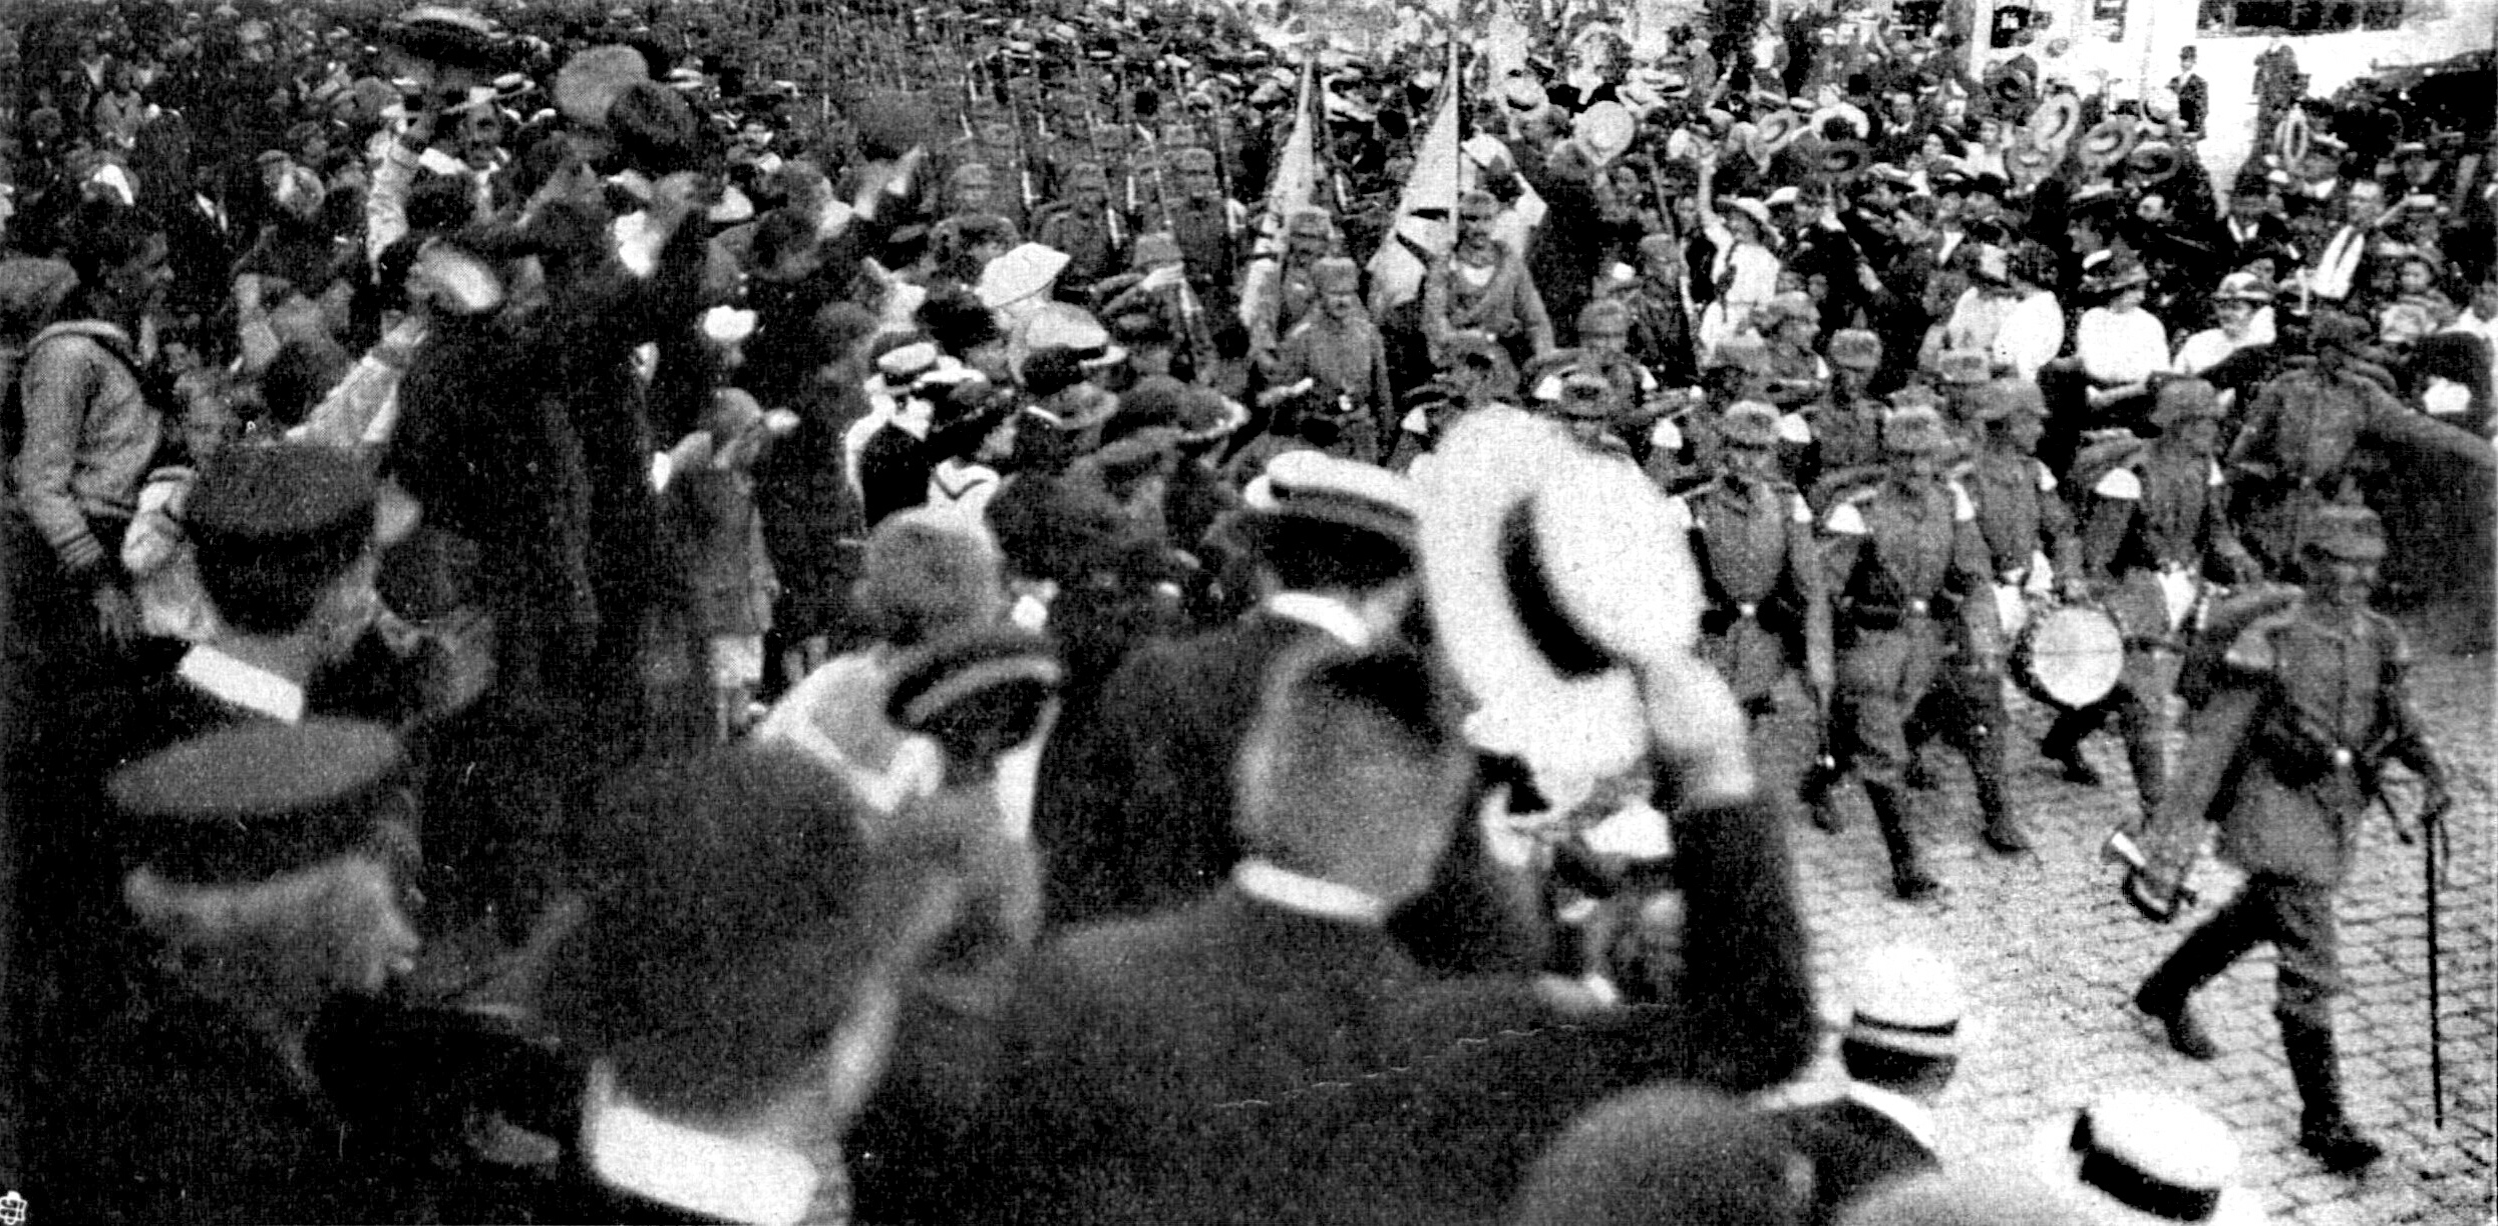 Abmarsch des Regiments Lübeck am 31.Juli 1914